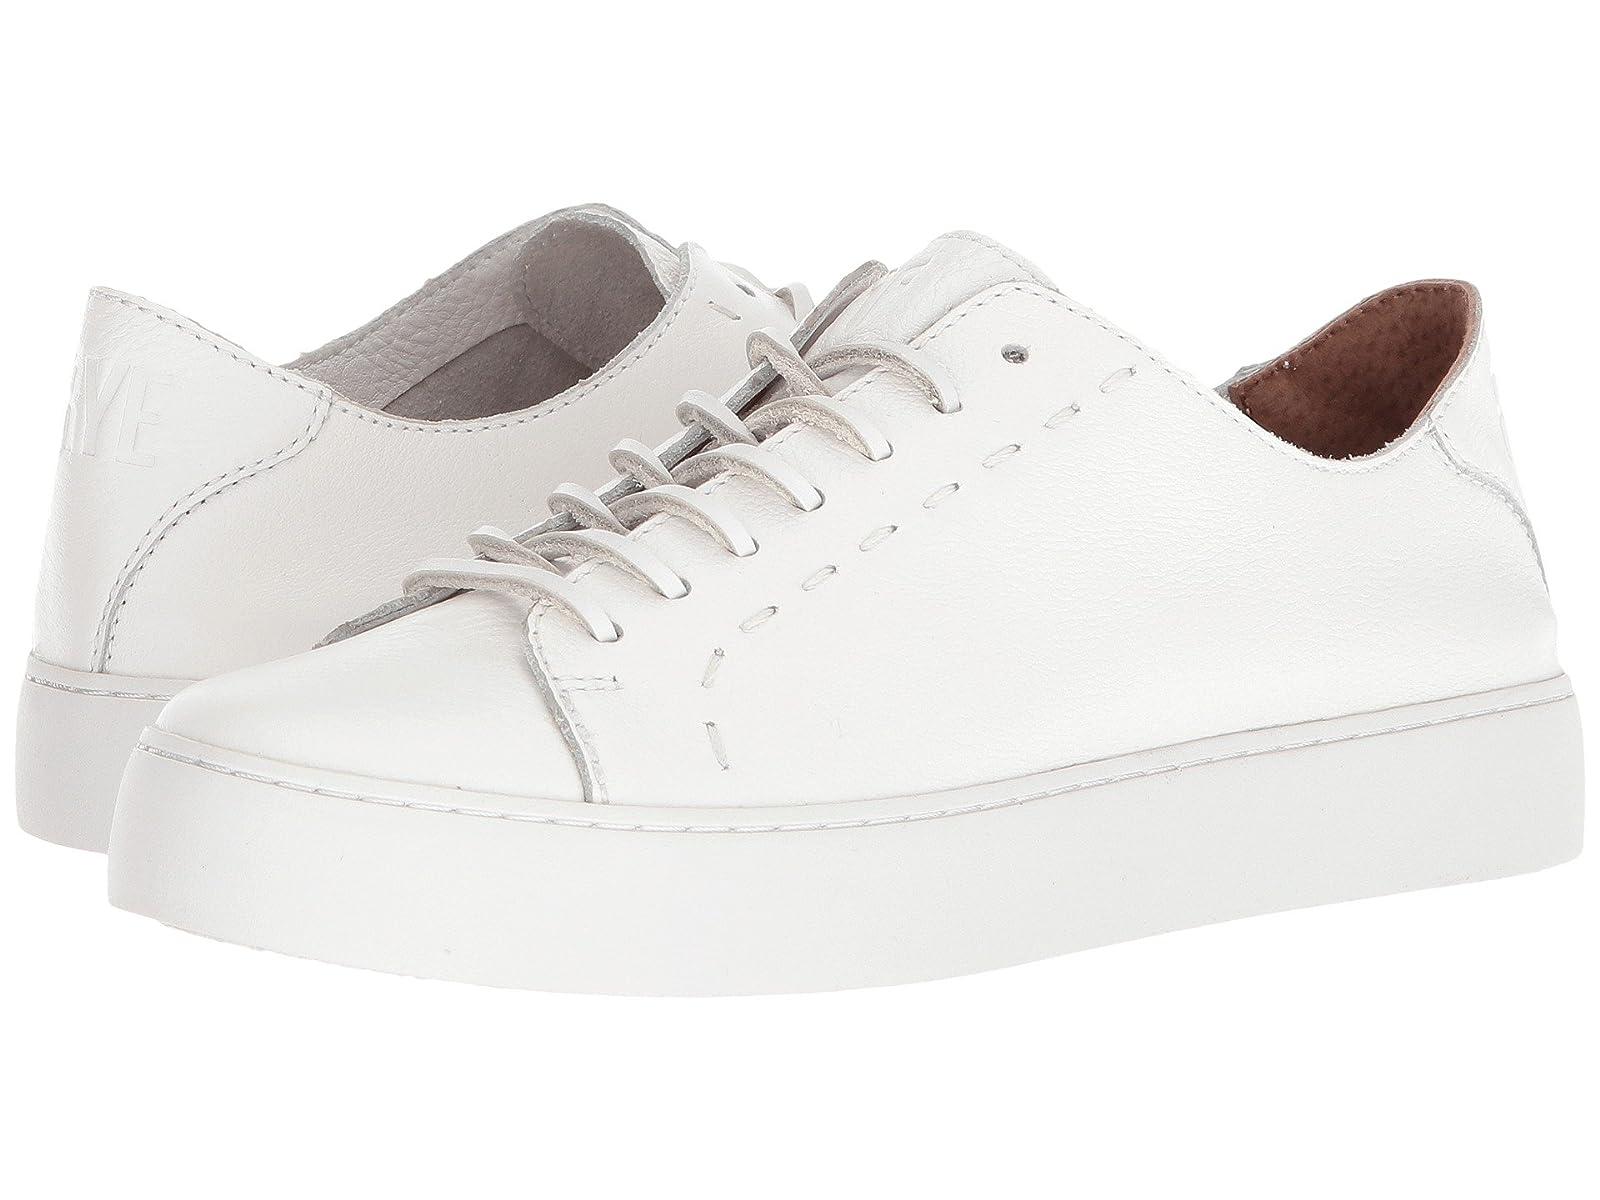 Frye Lena Low LaceAtmospheric grades have affordable shoes